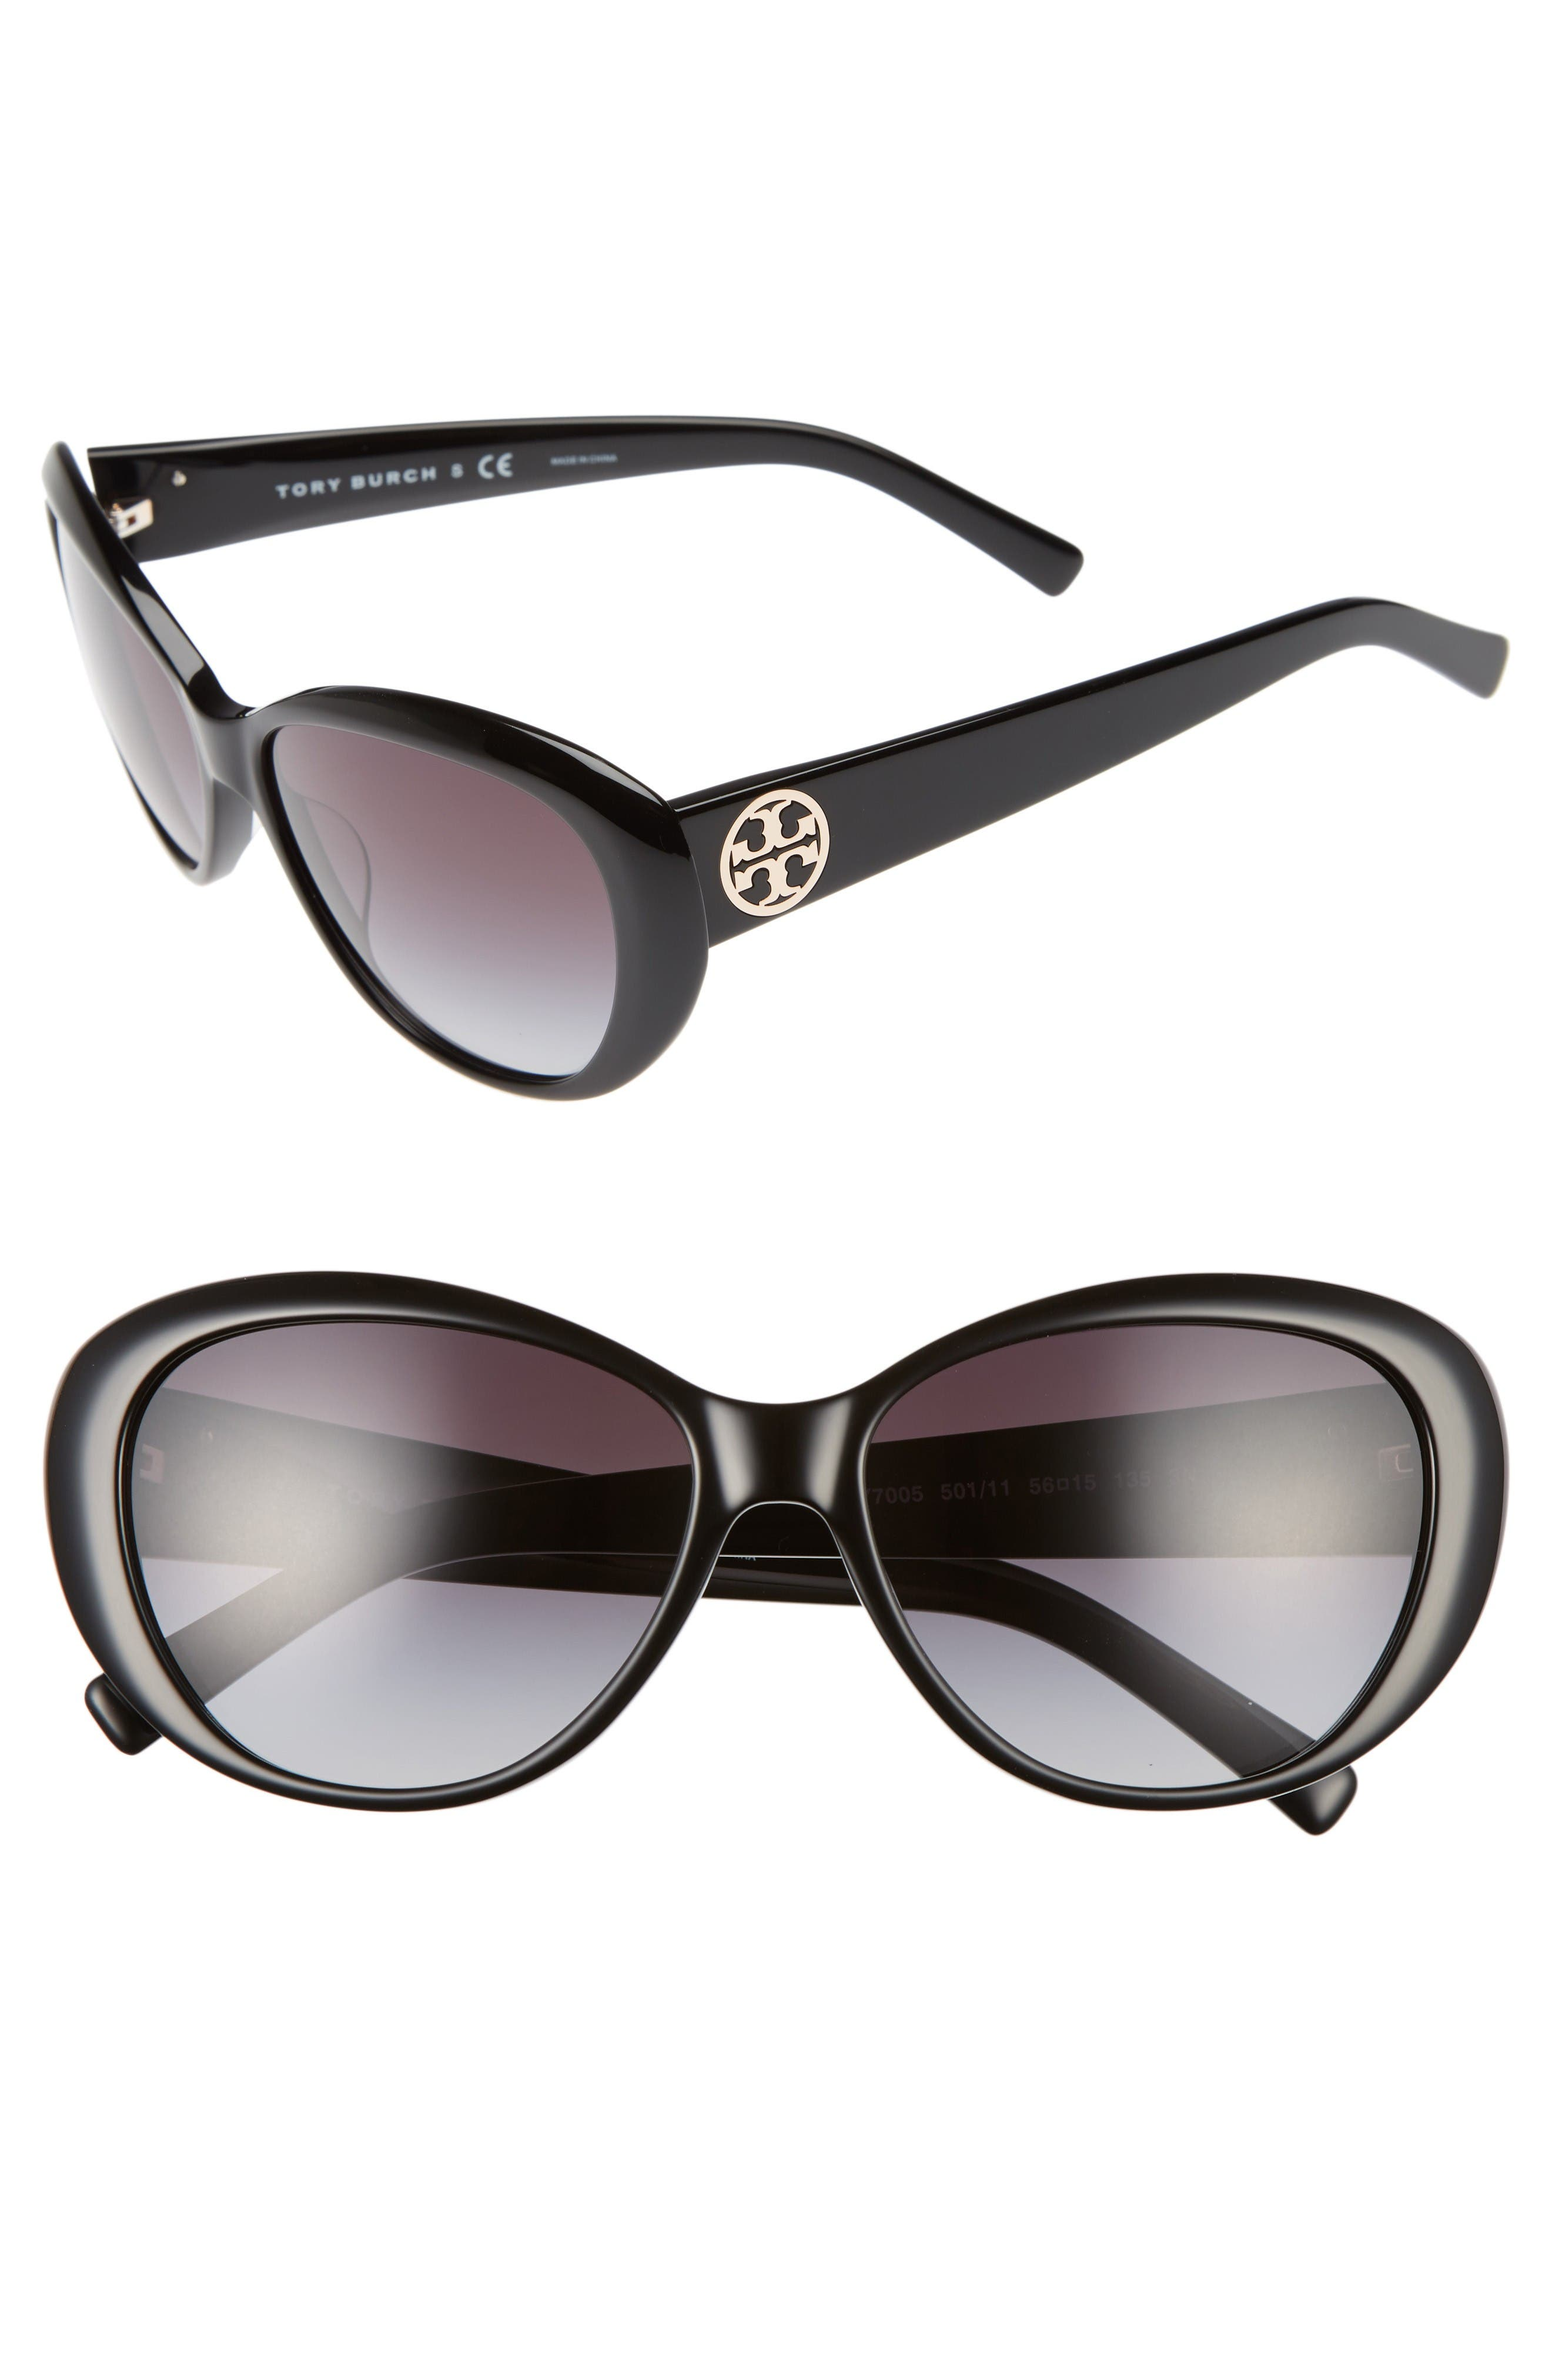 89adc8d4a4aab Cat-Eye Tory Burch Sunglasses